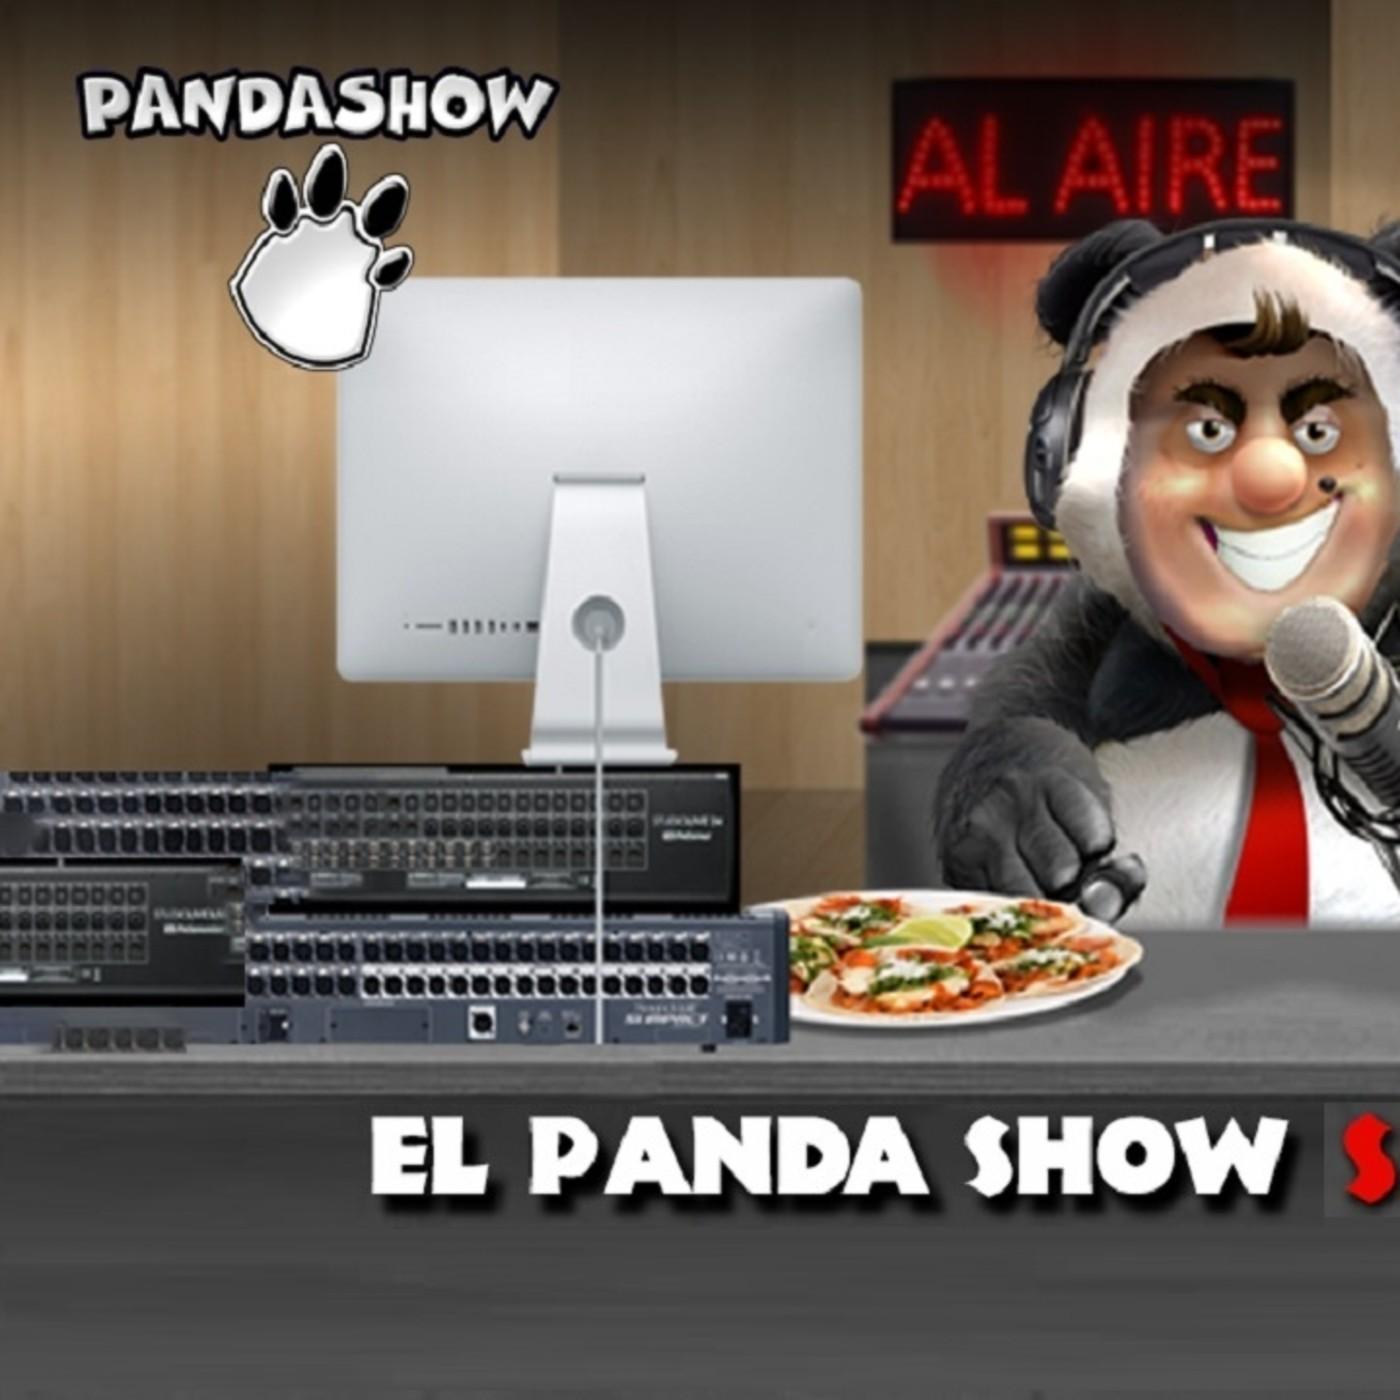 El Panda Show Ep. 408 Lunes 20 de abril 2020